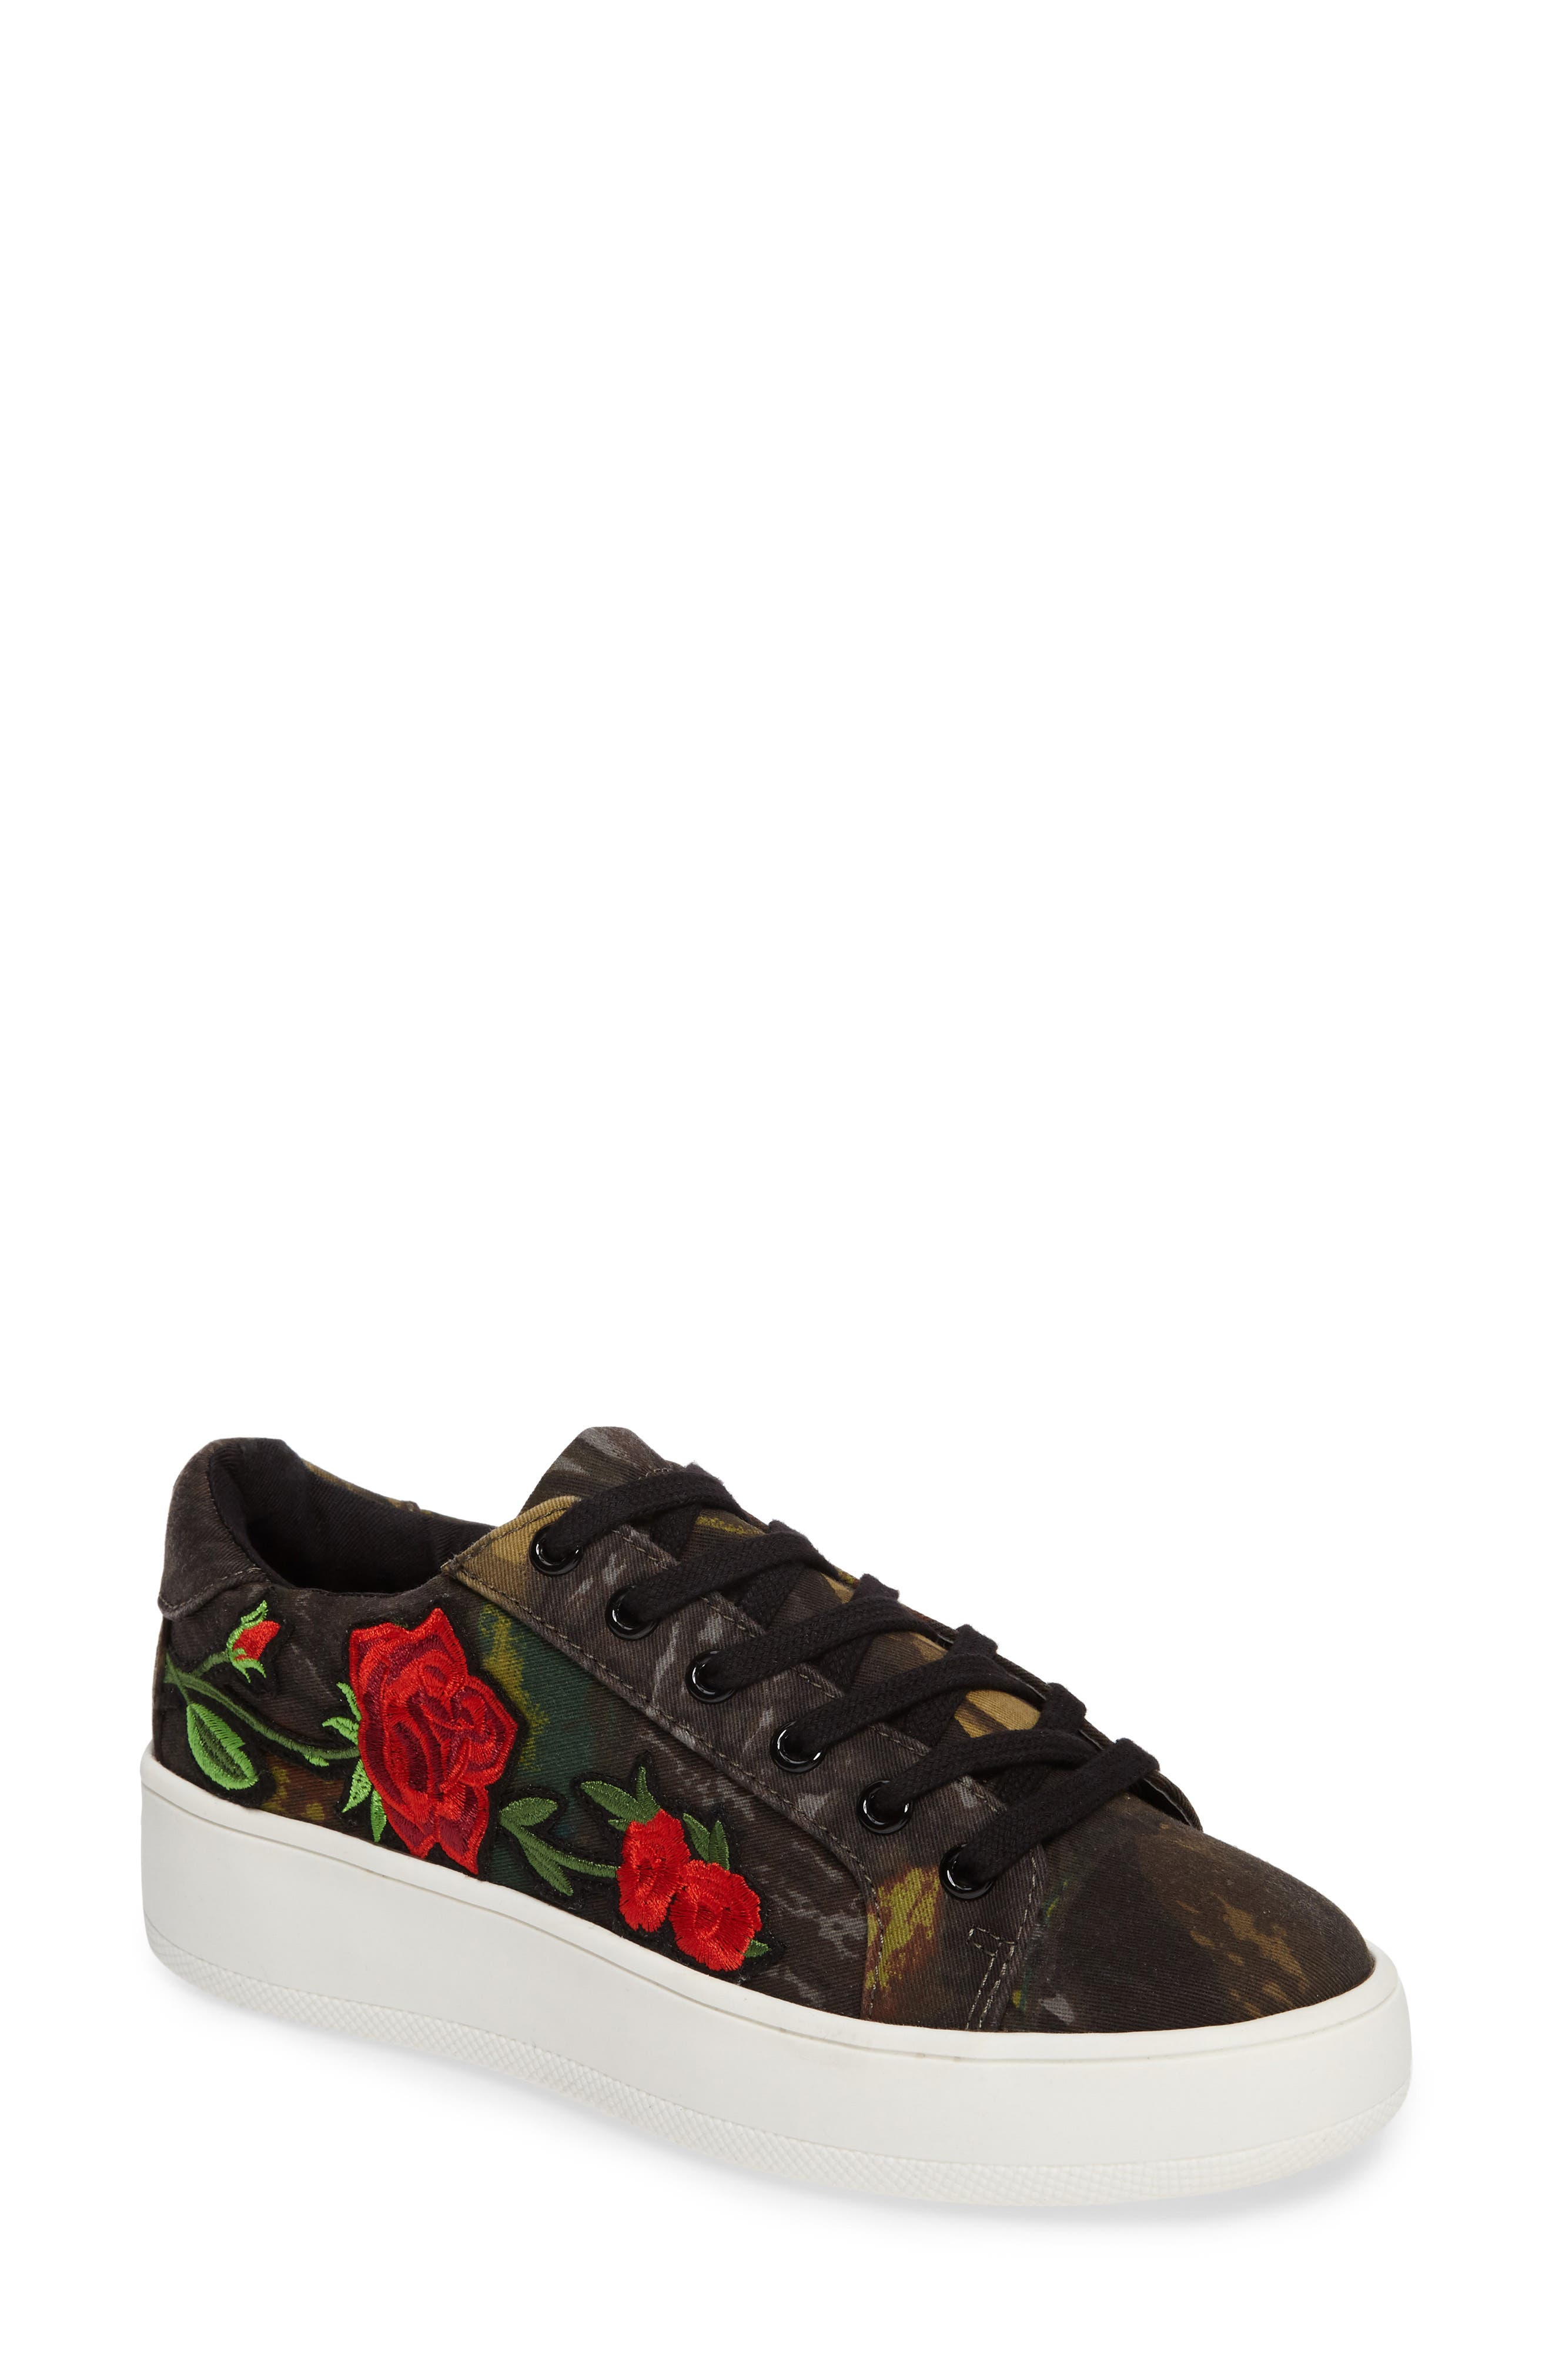 Steve Madden Bertie Floral Appliqué Sneaker (Women)